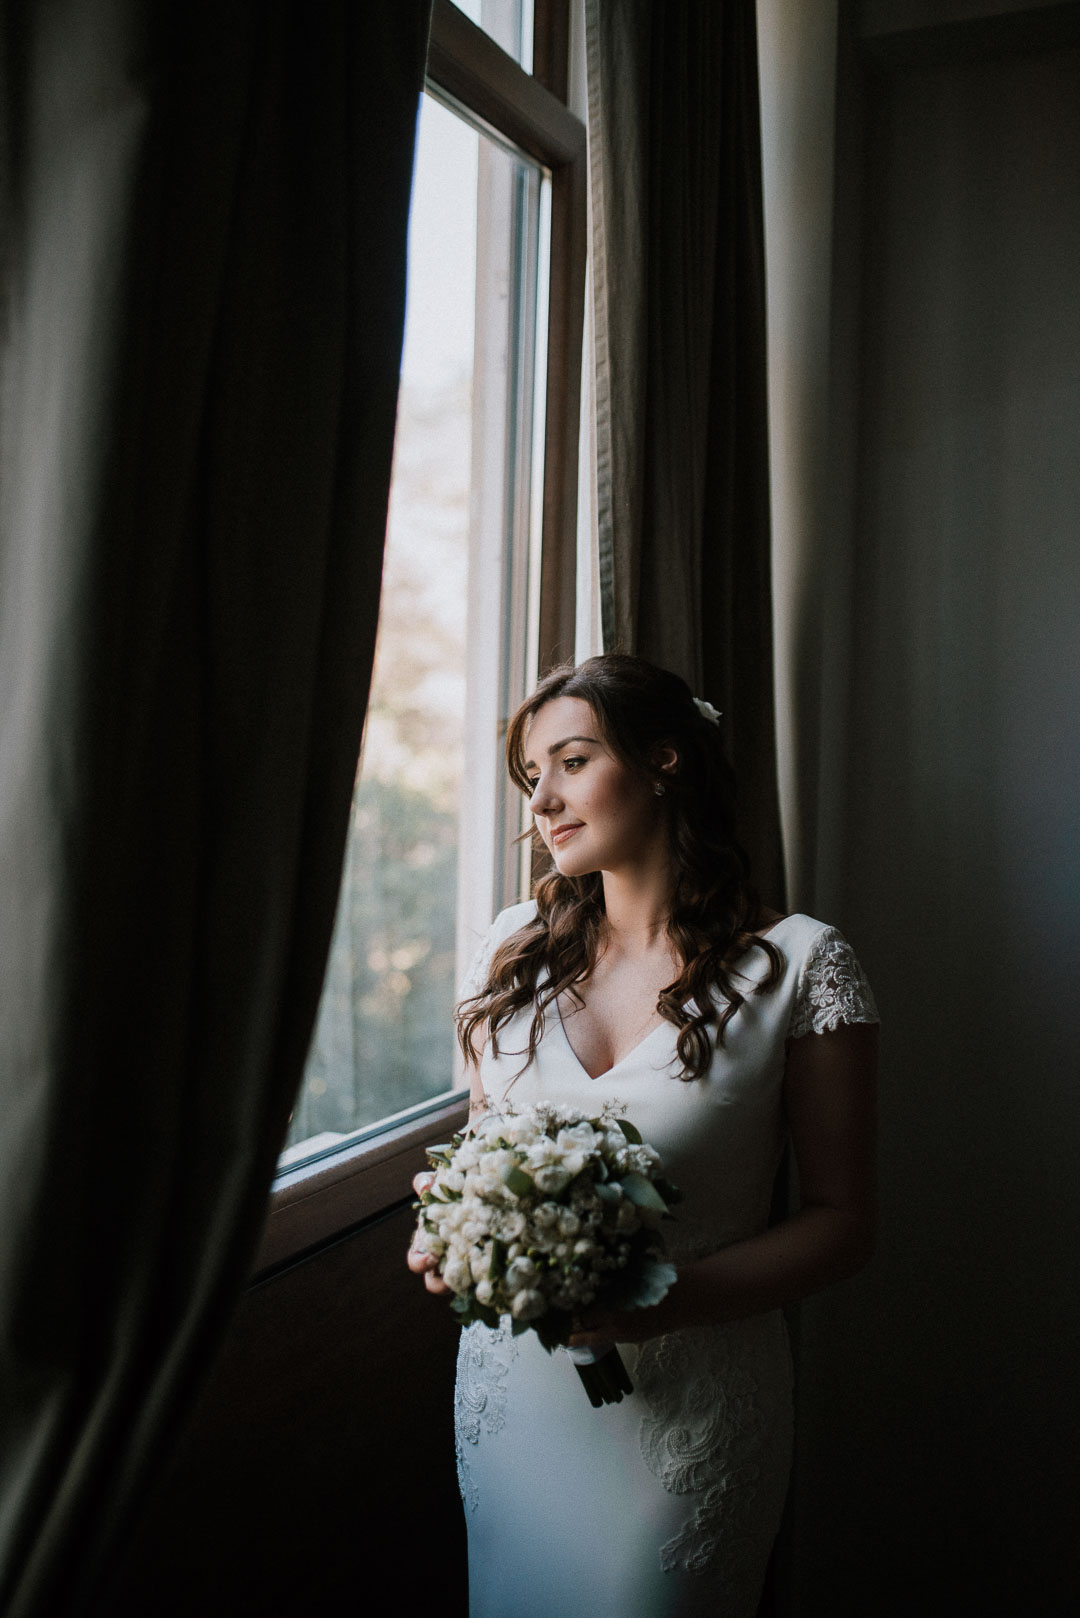 wedding-photographer-destination-fineart-bespoke-reportage-sorrento-parcodeiprincipi-vivianeizzo-spazio46-29